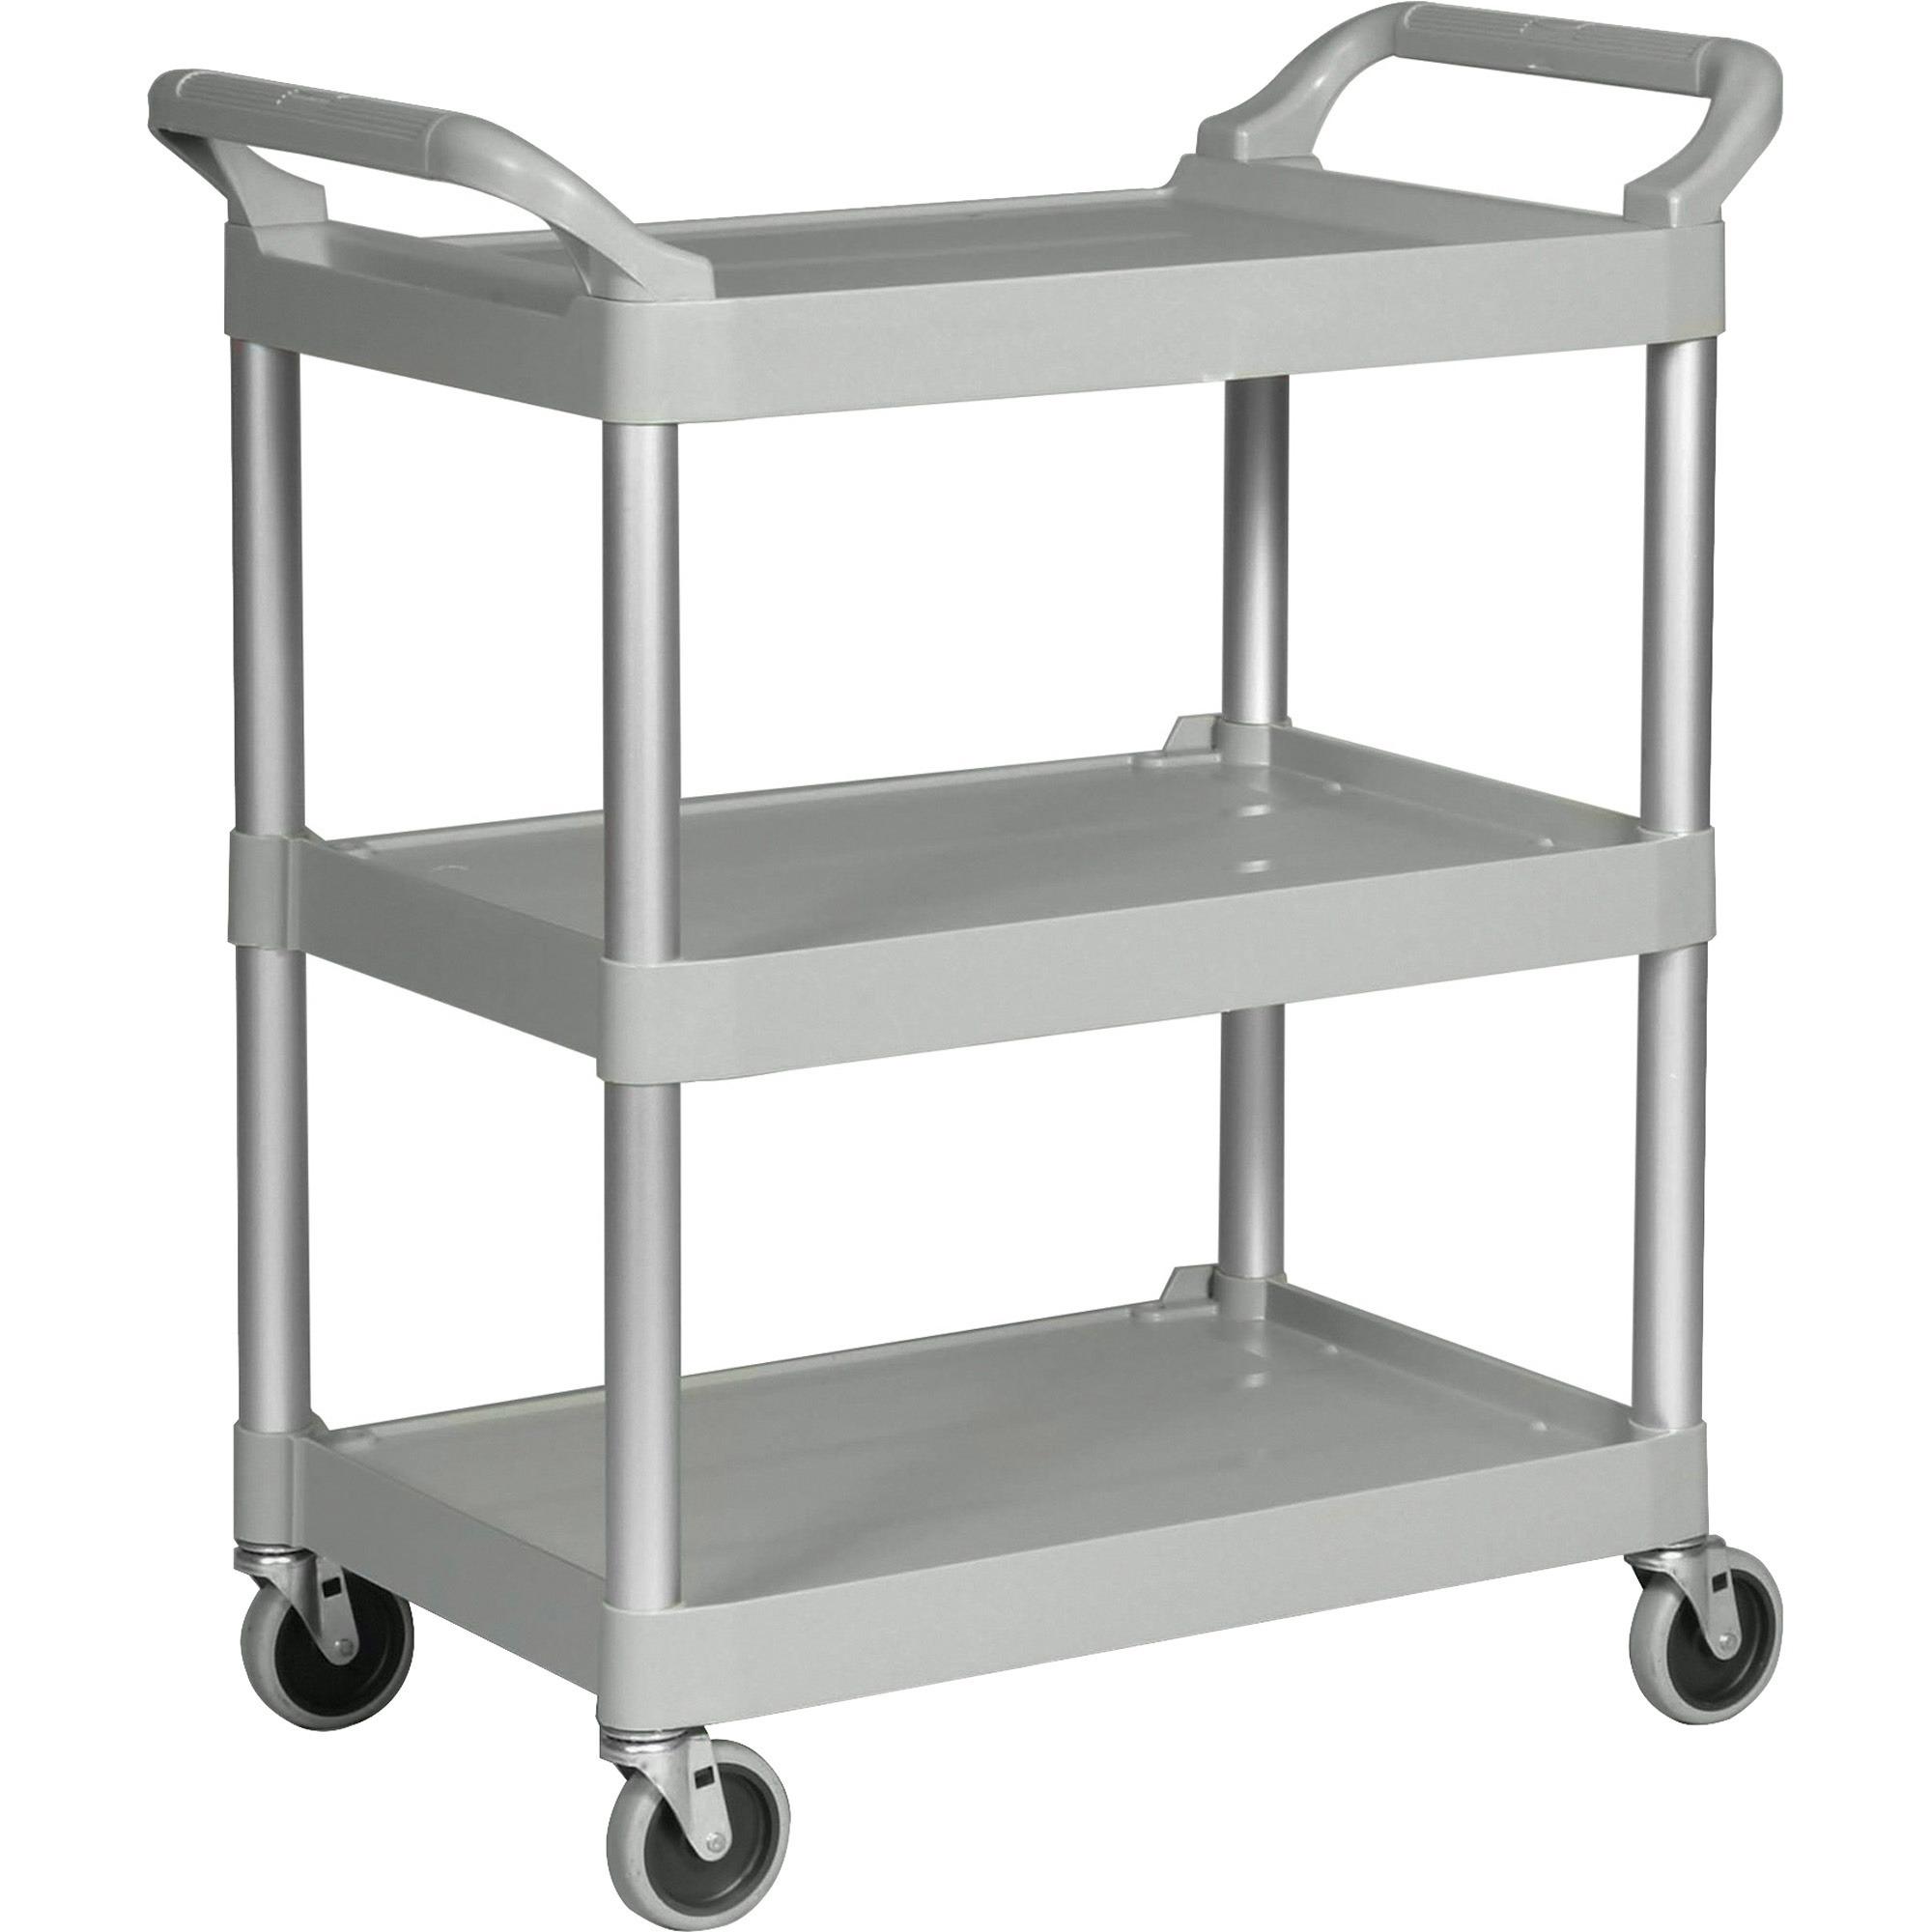 Rubbermaid Commercial 3-Shelf Utility Service Cart